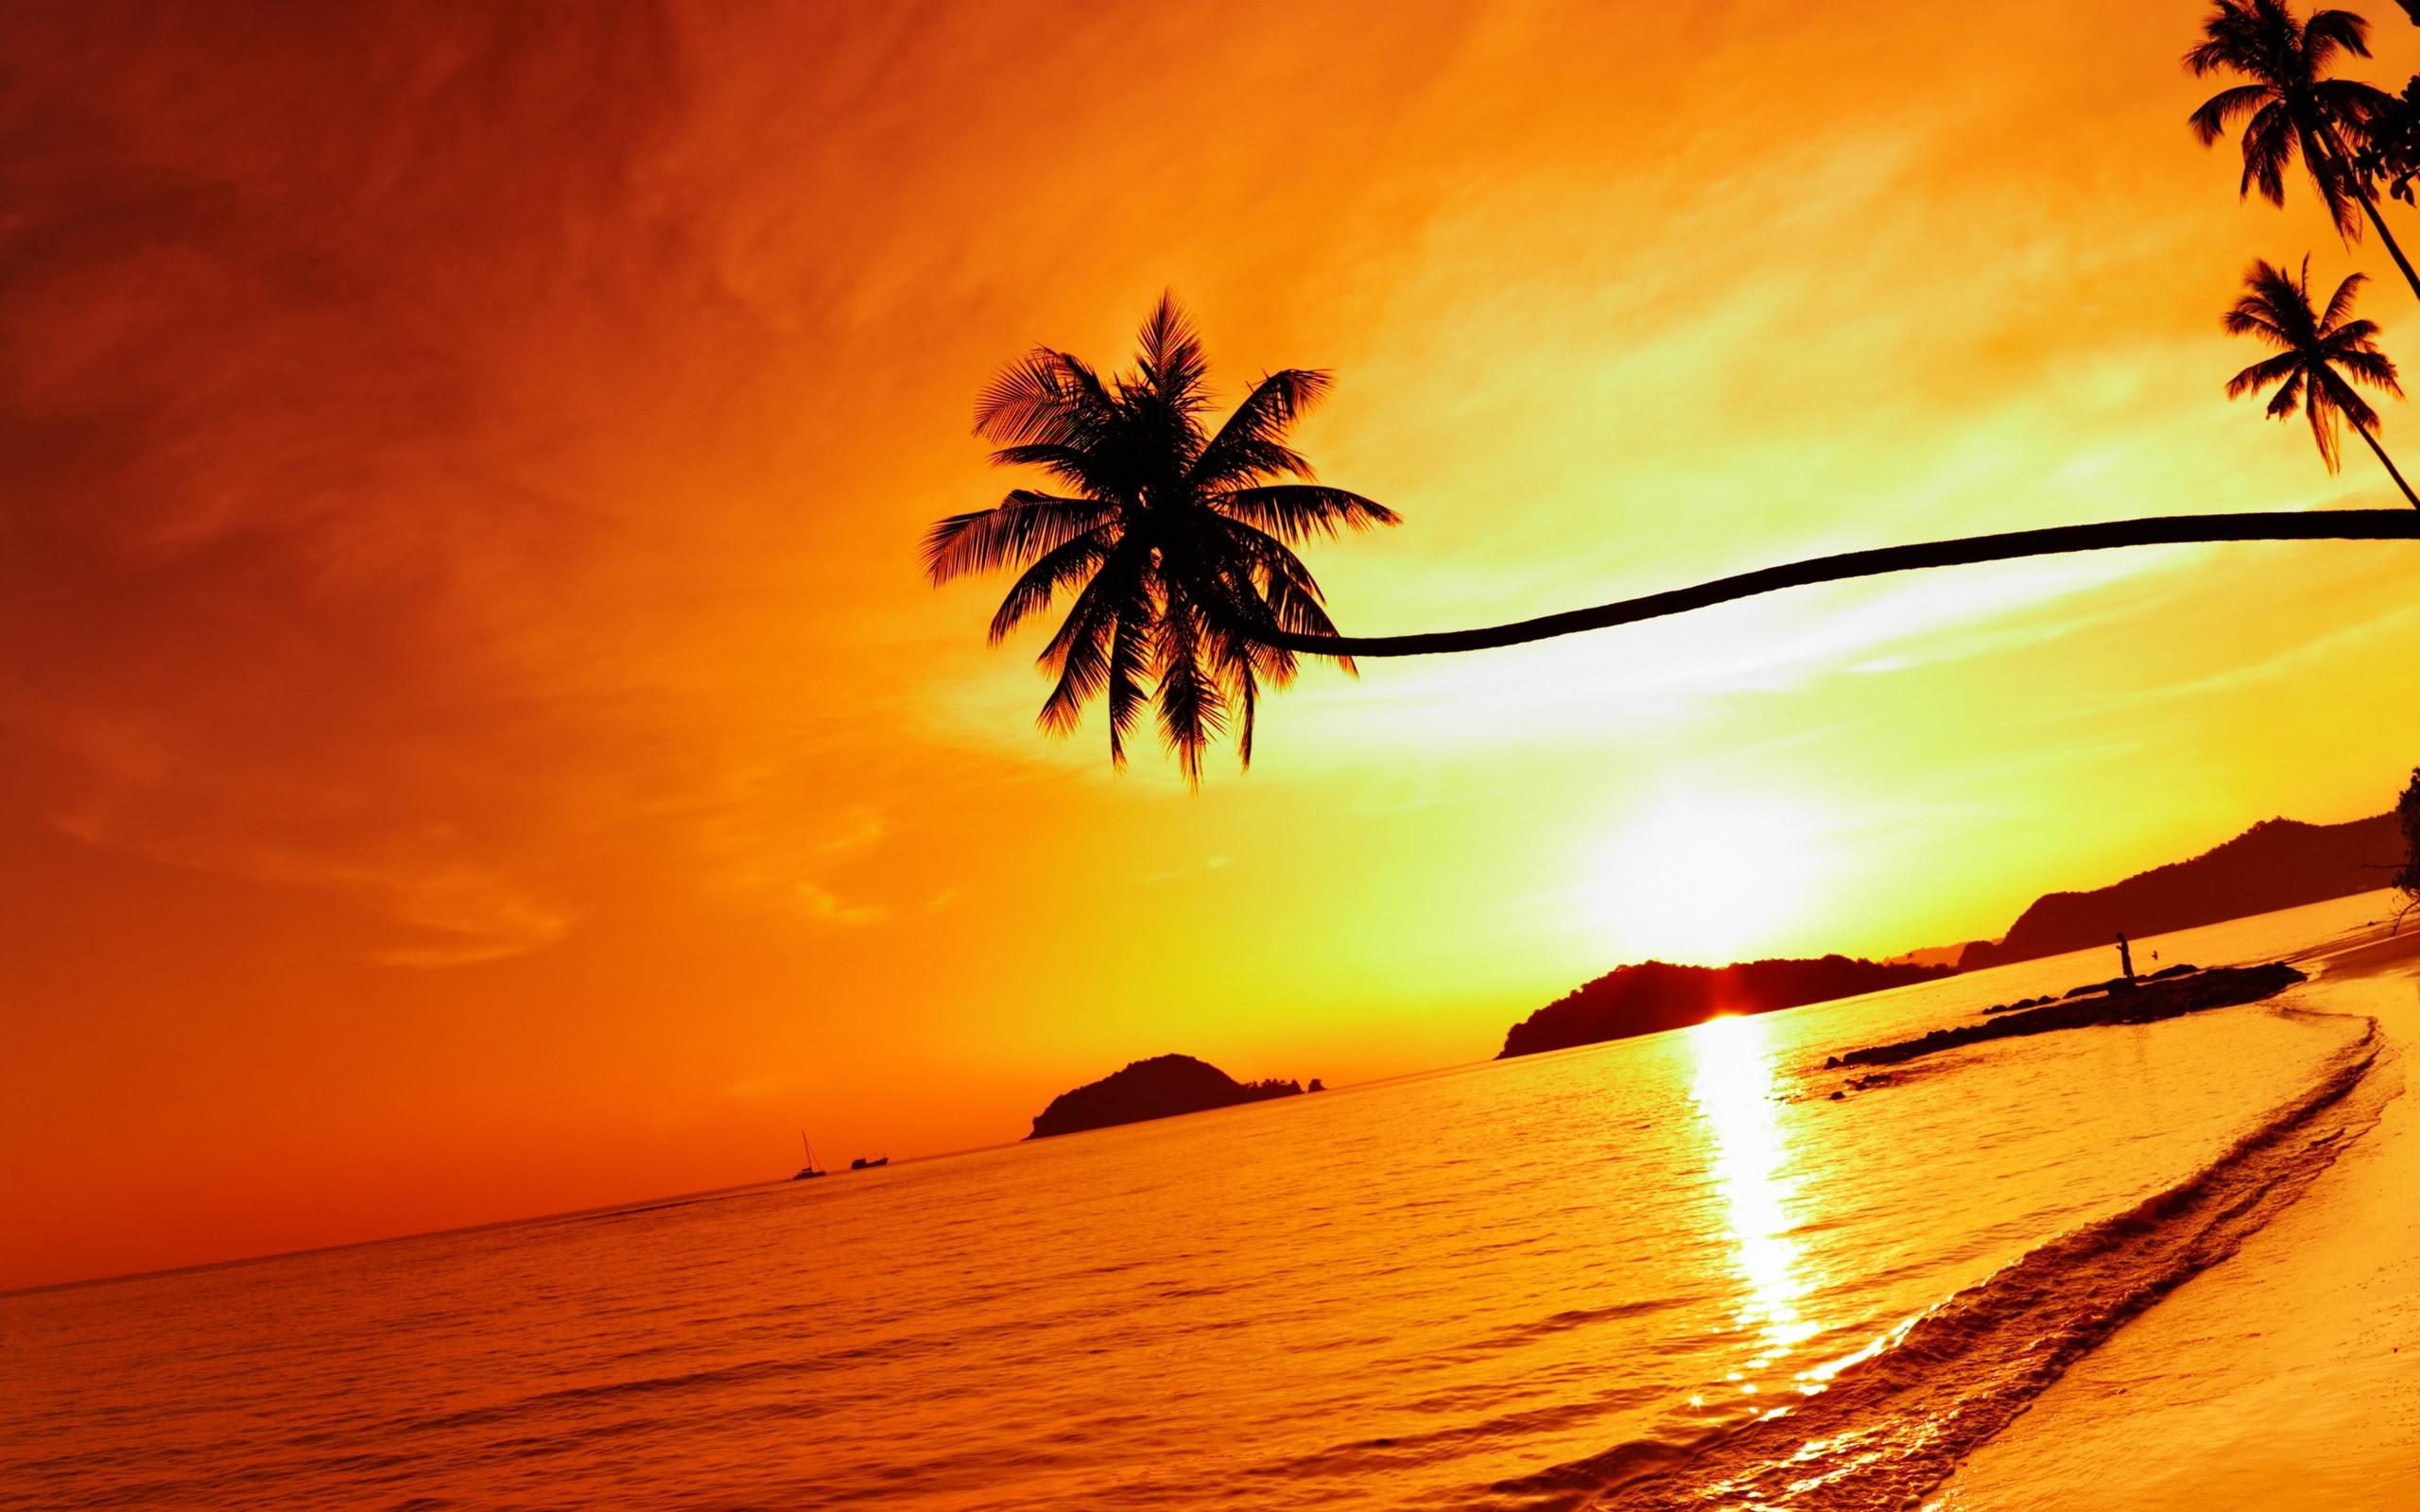 Hd Island Sunset 4k Cover